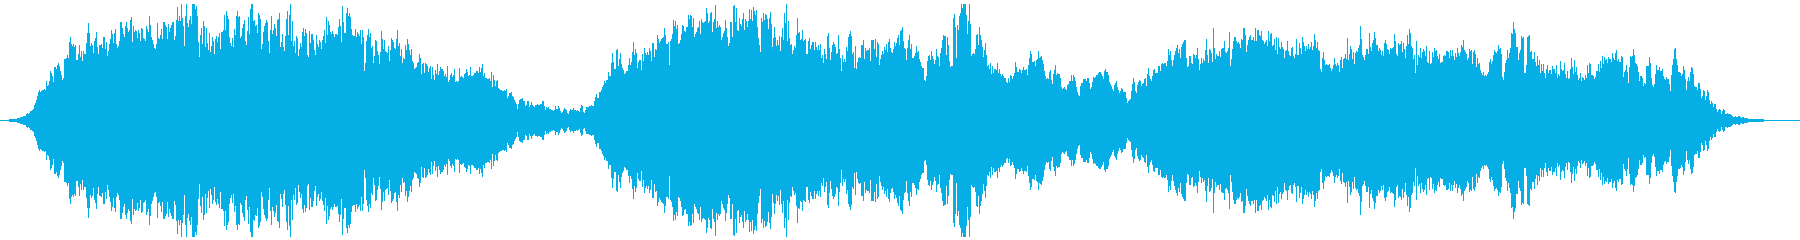 PADS ゴーストシップ01の再生済みの波形